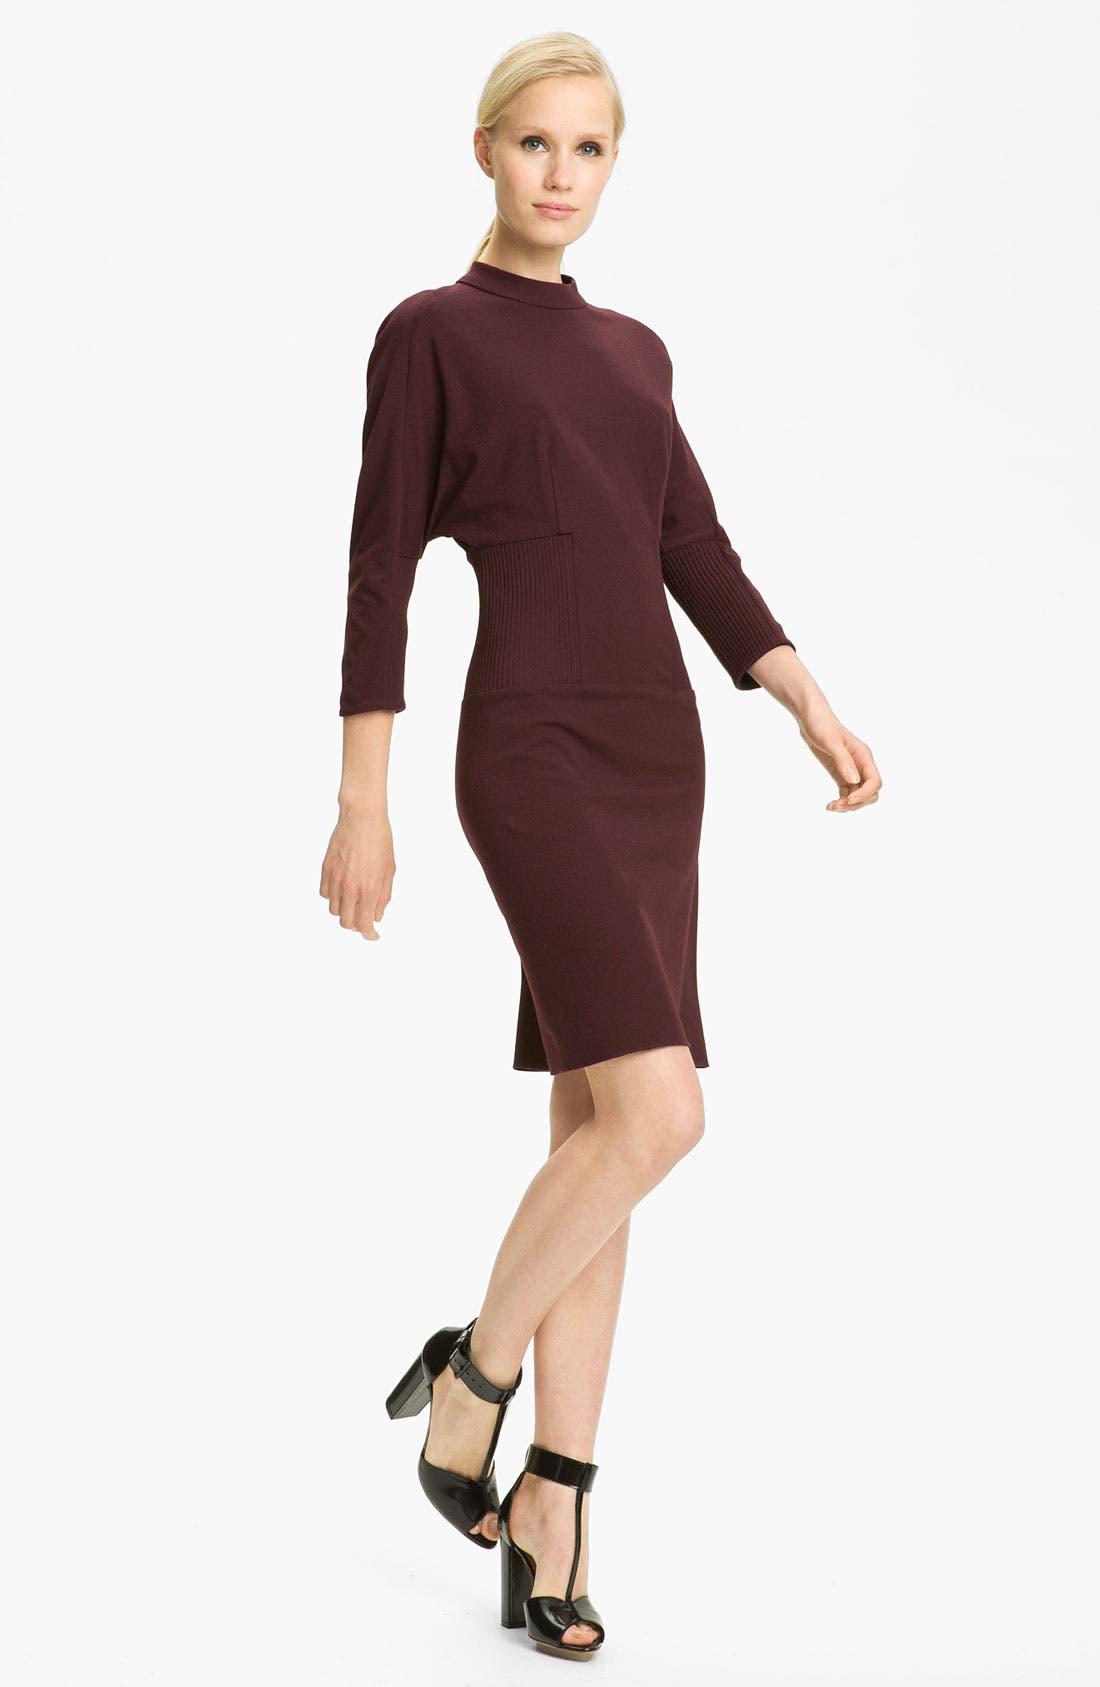 Alternate Image 1 Selected - 3.1 Phillip Lim Funnel Neck Dress